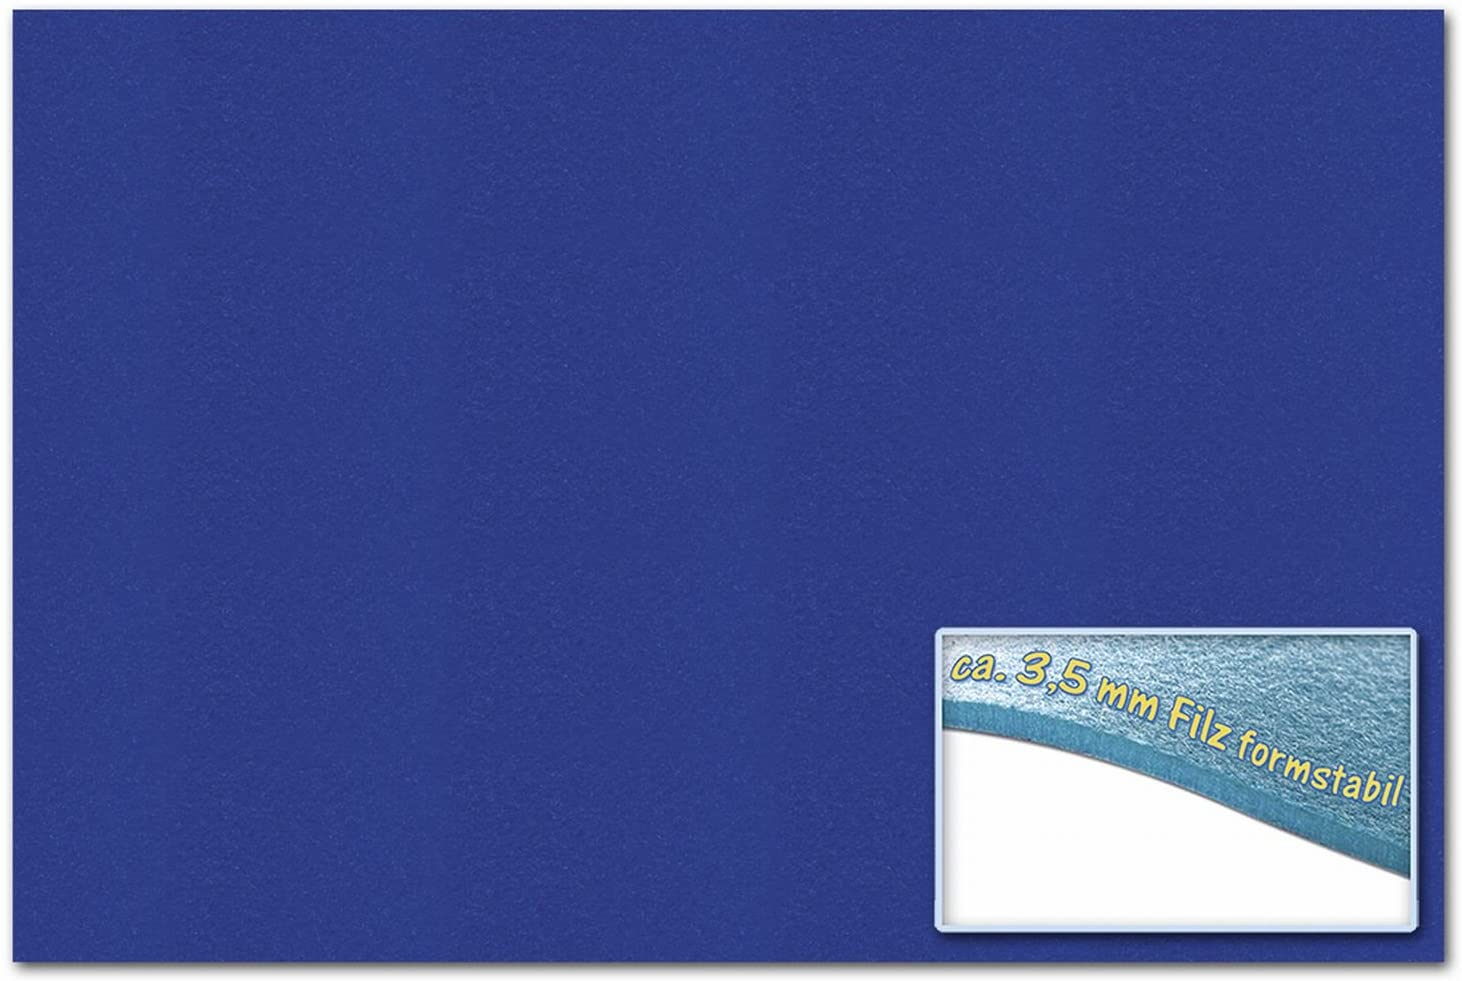 Bringmann Folia 510336 -  Felt 30 x 45 cm, ca. 3.5 mm, 1 Sheet, Ultra Marine